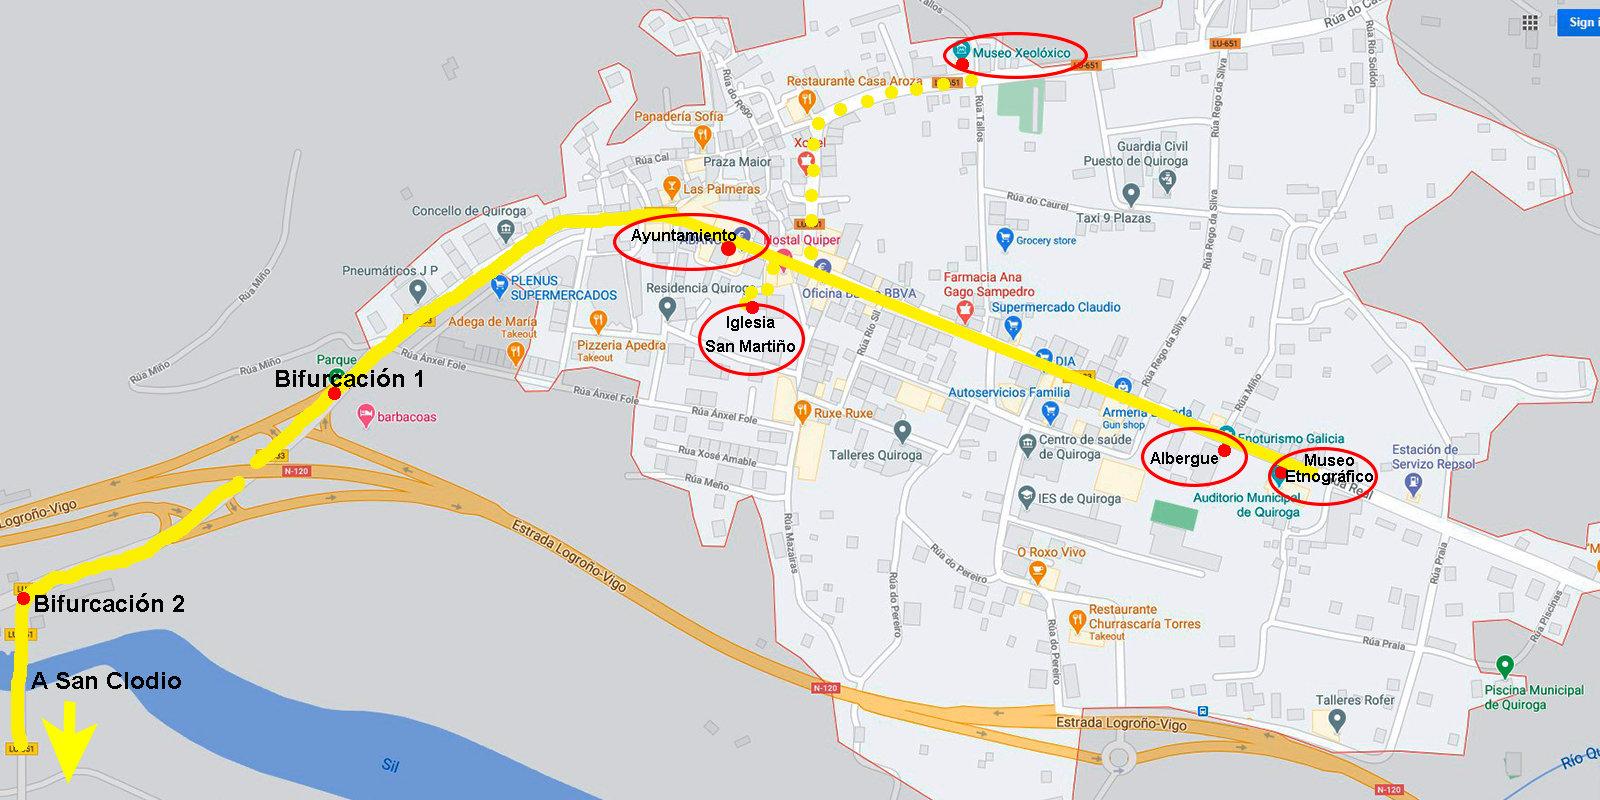 Mapa de Quiroga-WEB.jpg